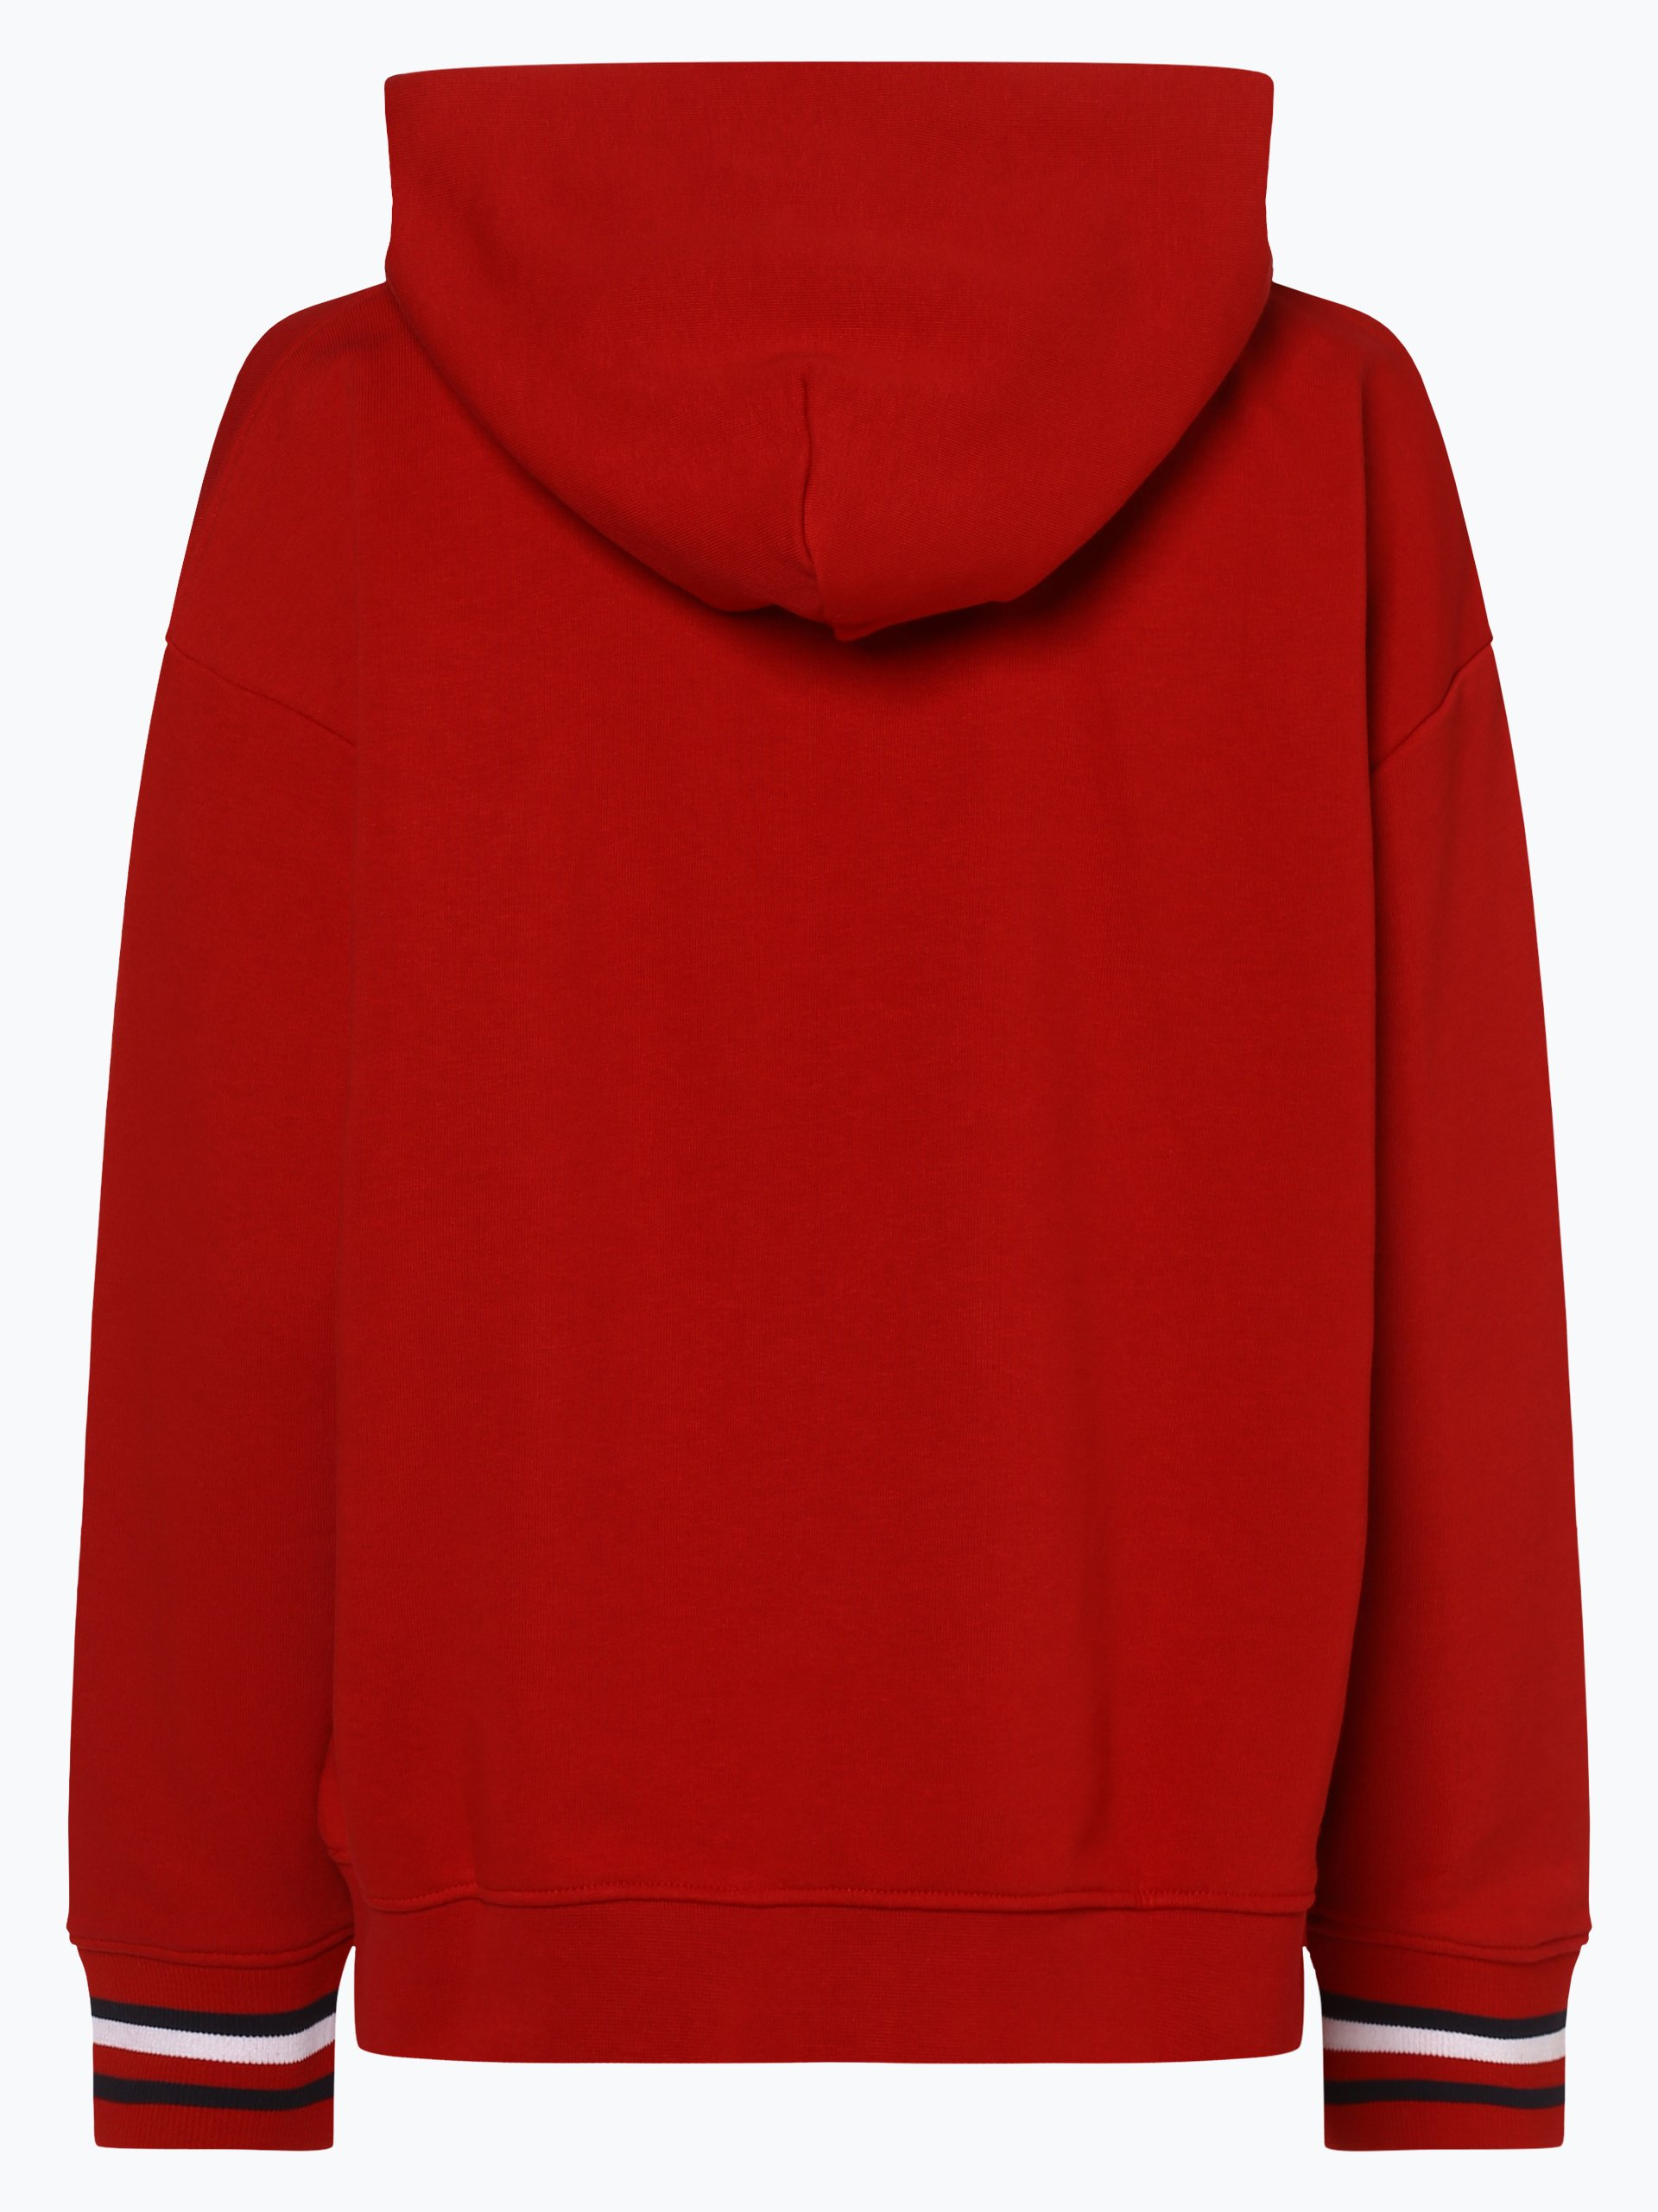 Tommy Hilfiger Damen Sweatshirt - Diana